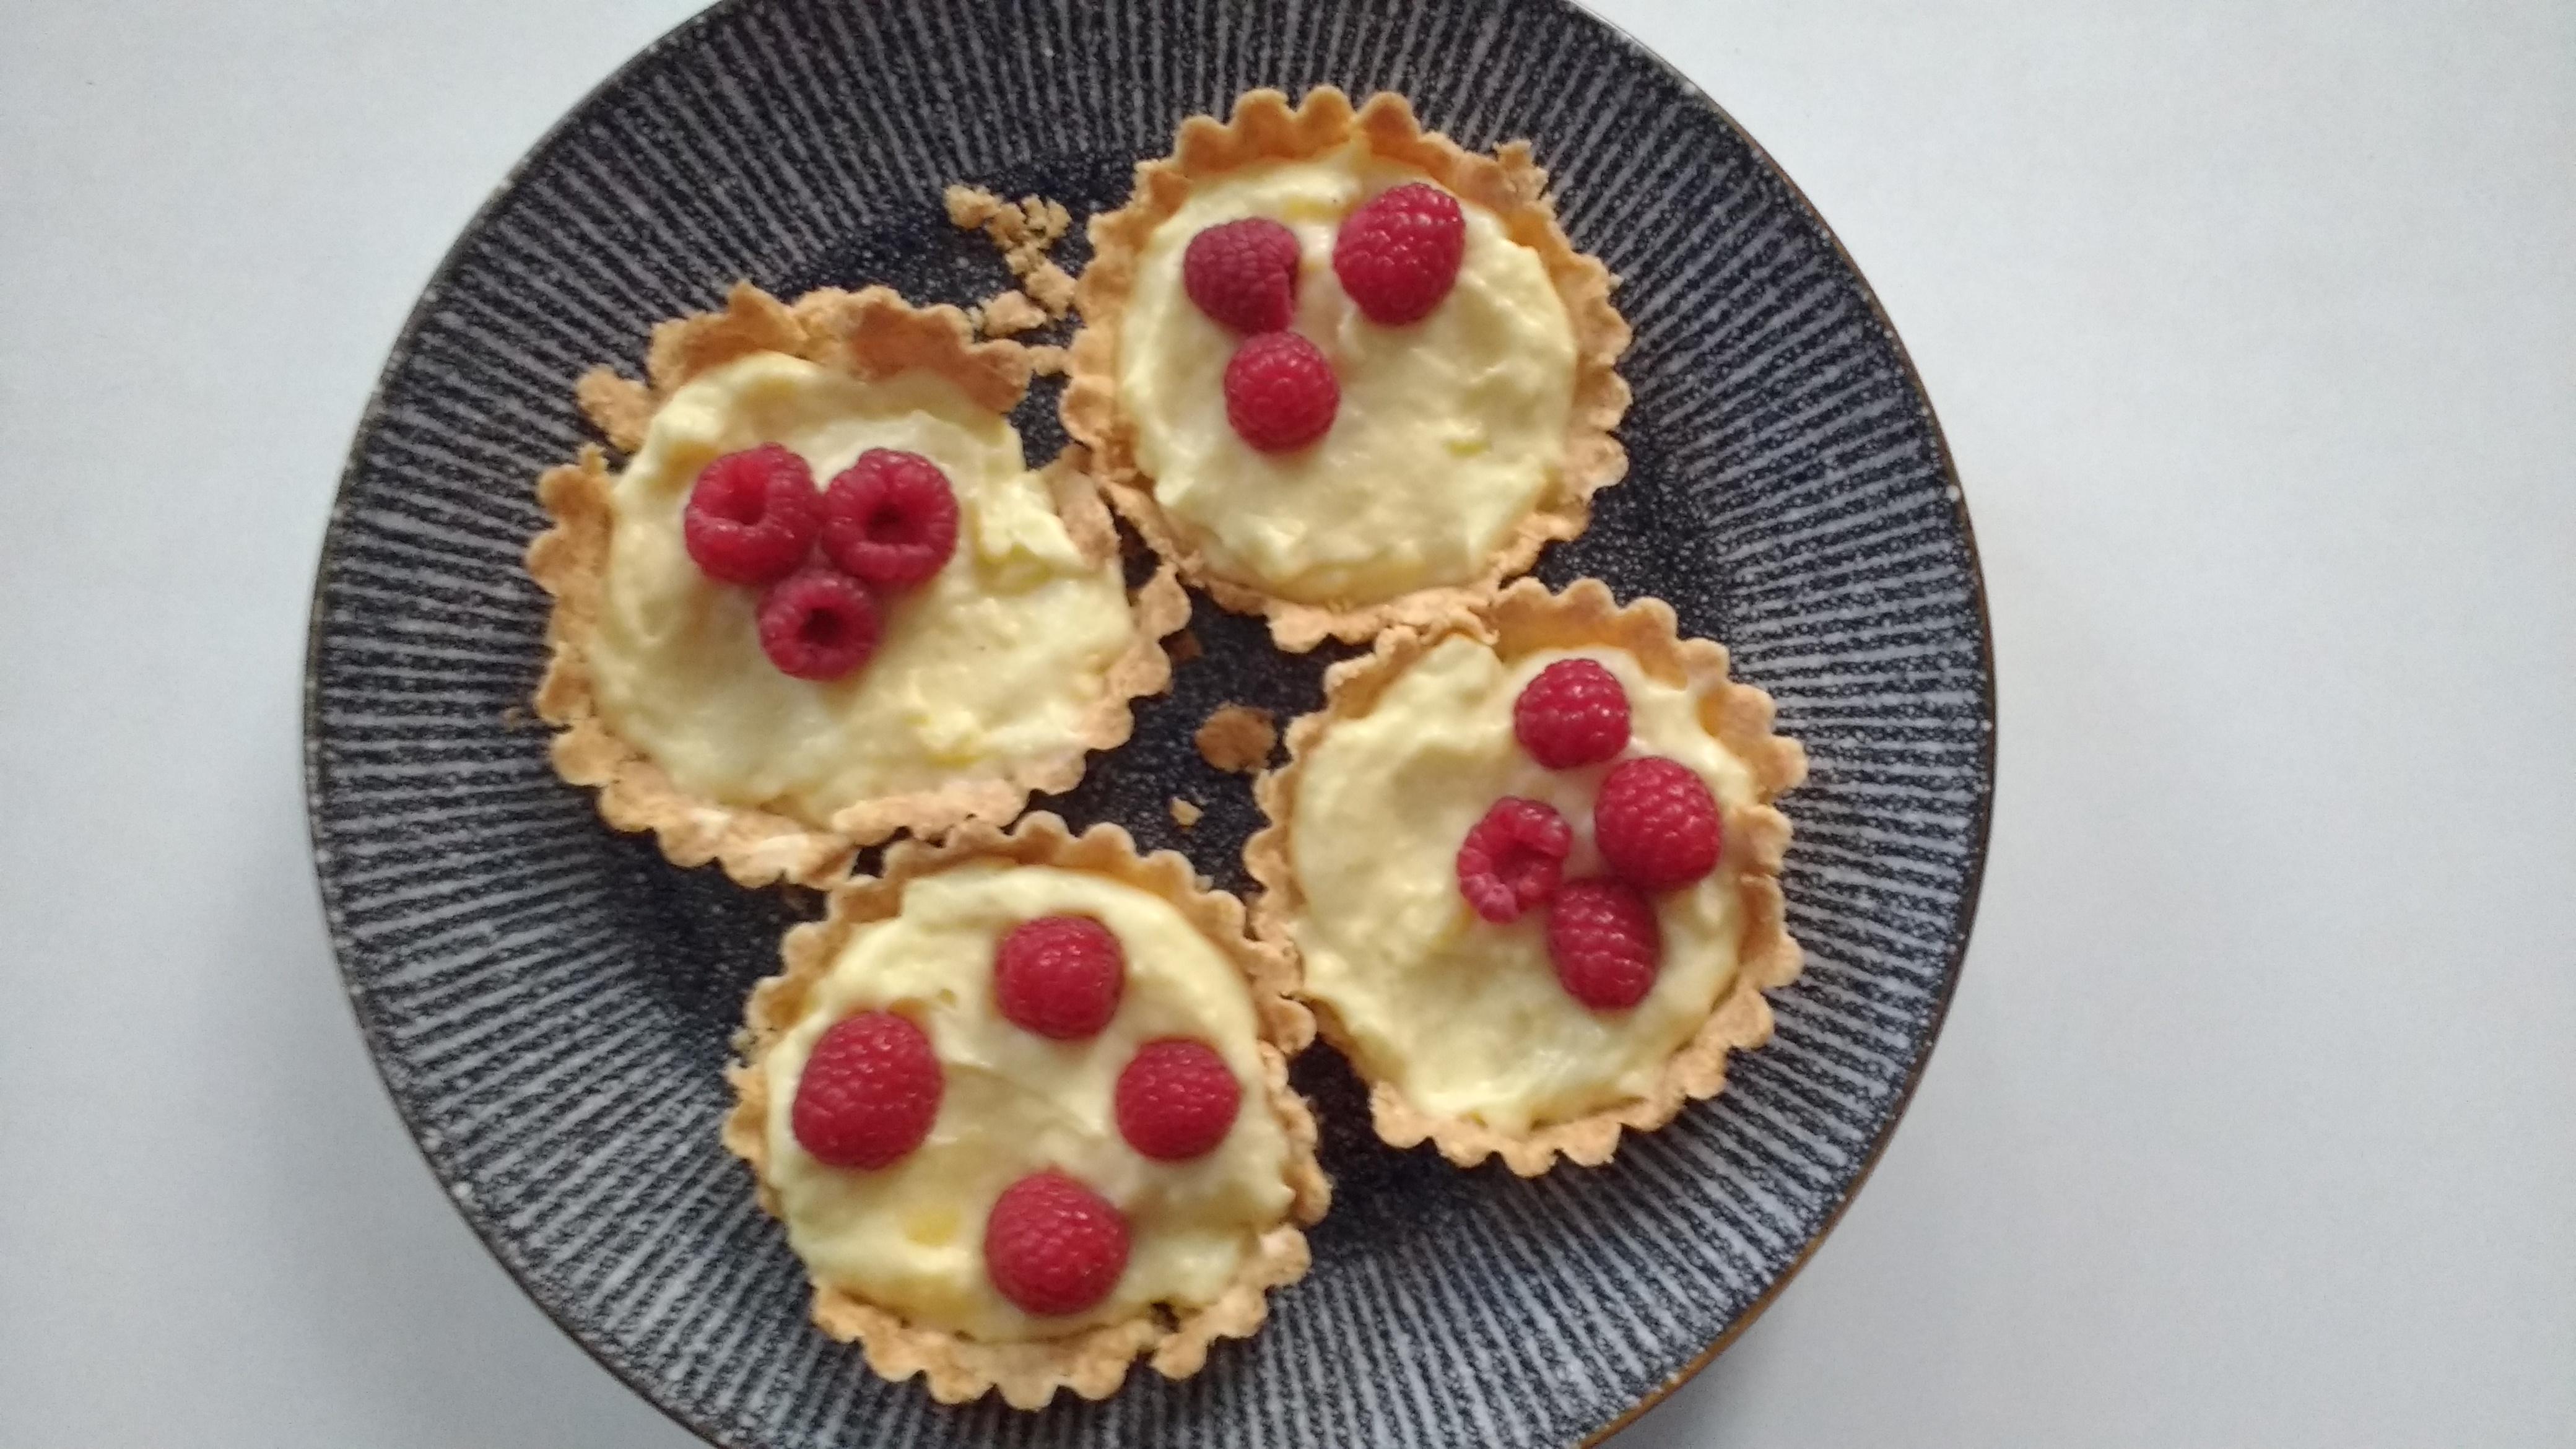 Tartelettes met zwitserse room en frambozen